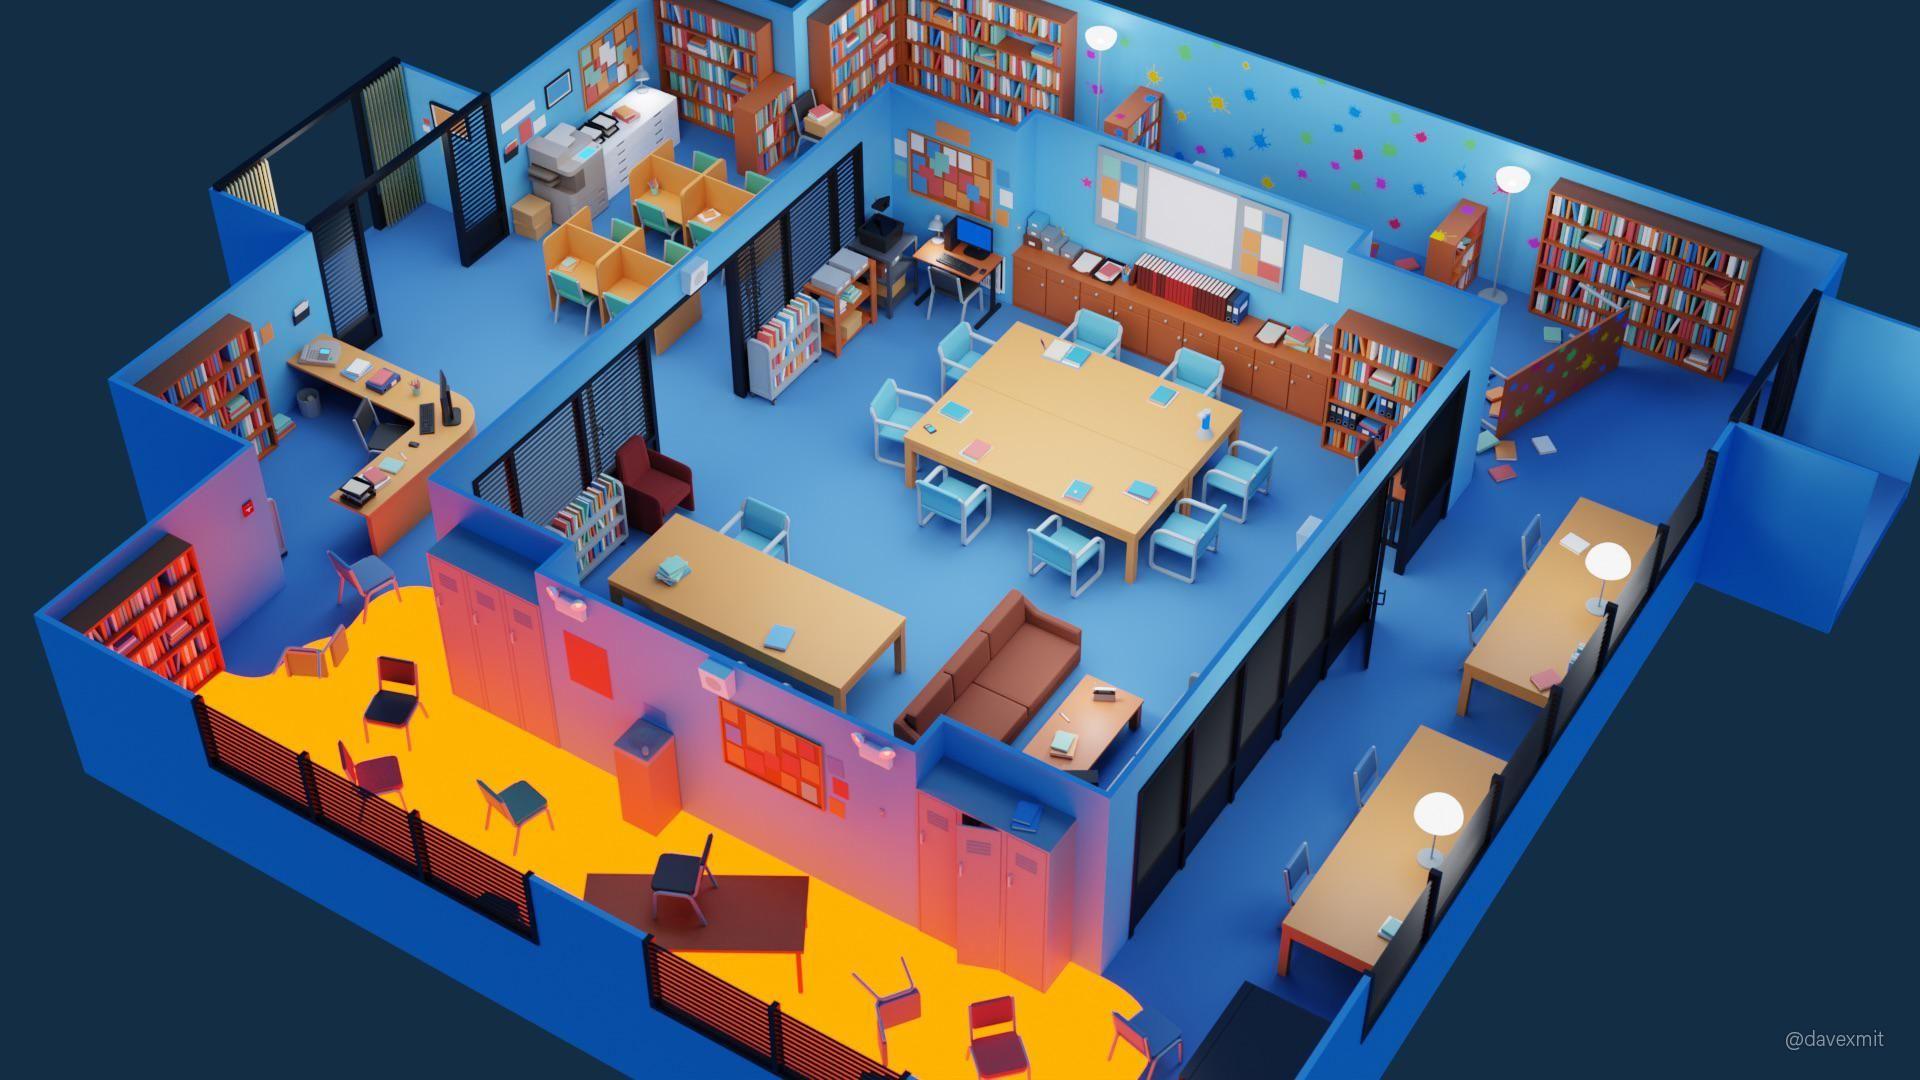 I created a community tv show set low poly diorama